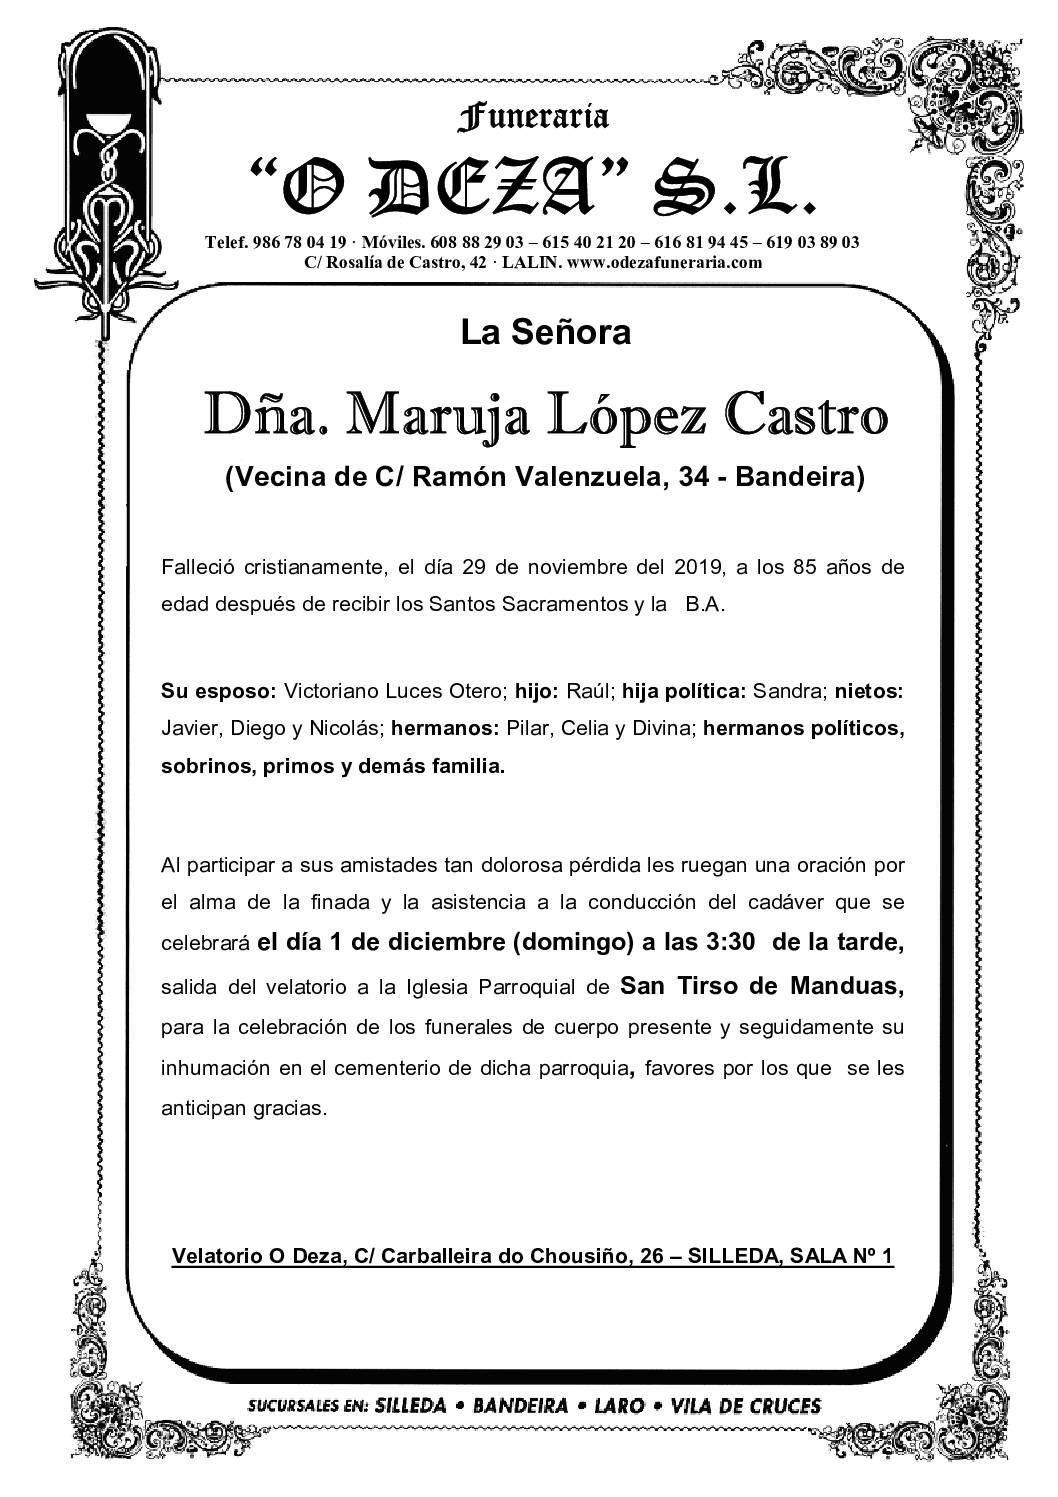 DÑA. MARUJA LÓPEZ CASTRO